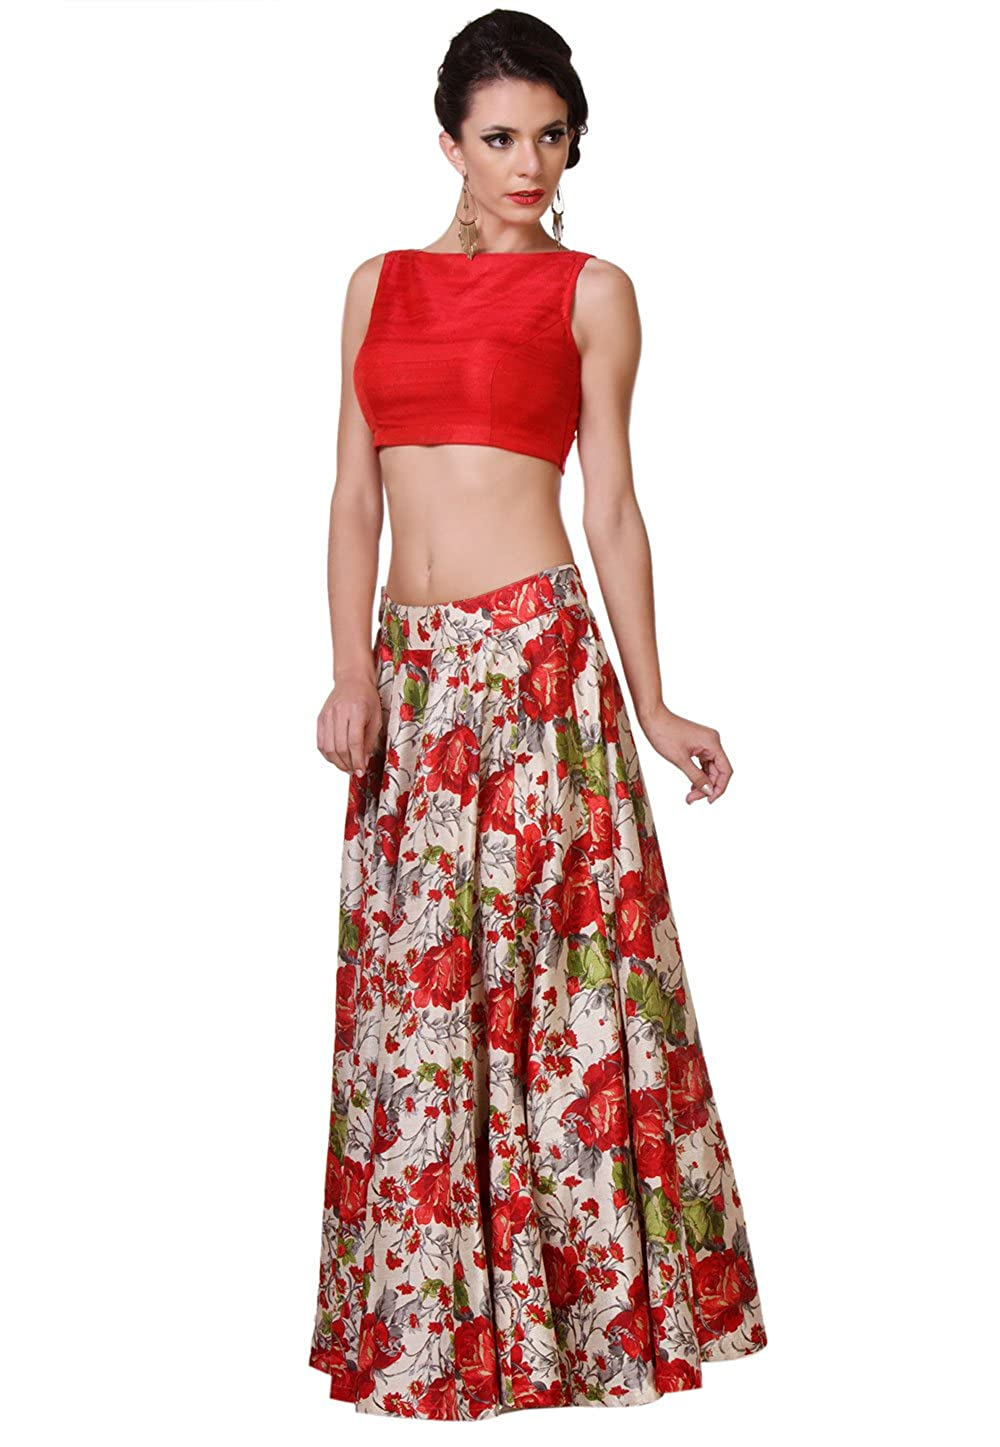 def07aa9e73 Utsav Fashion Women's Raw Silk Readymade Top Skirt 38 Red: Amazon.co.uk:  Clothing